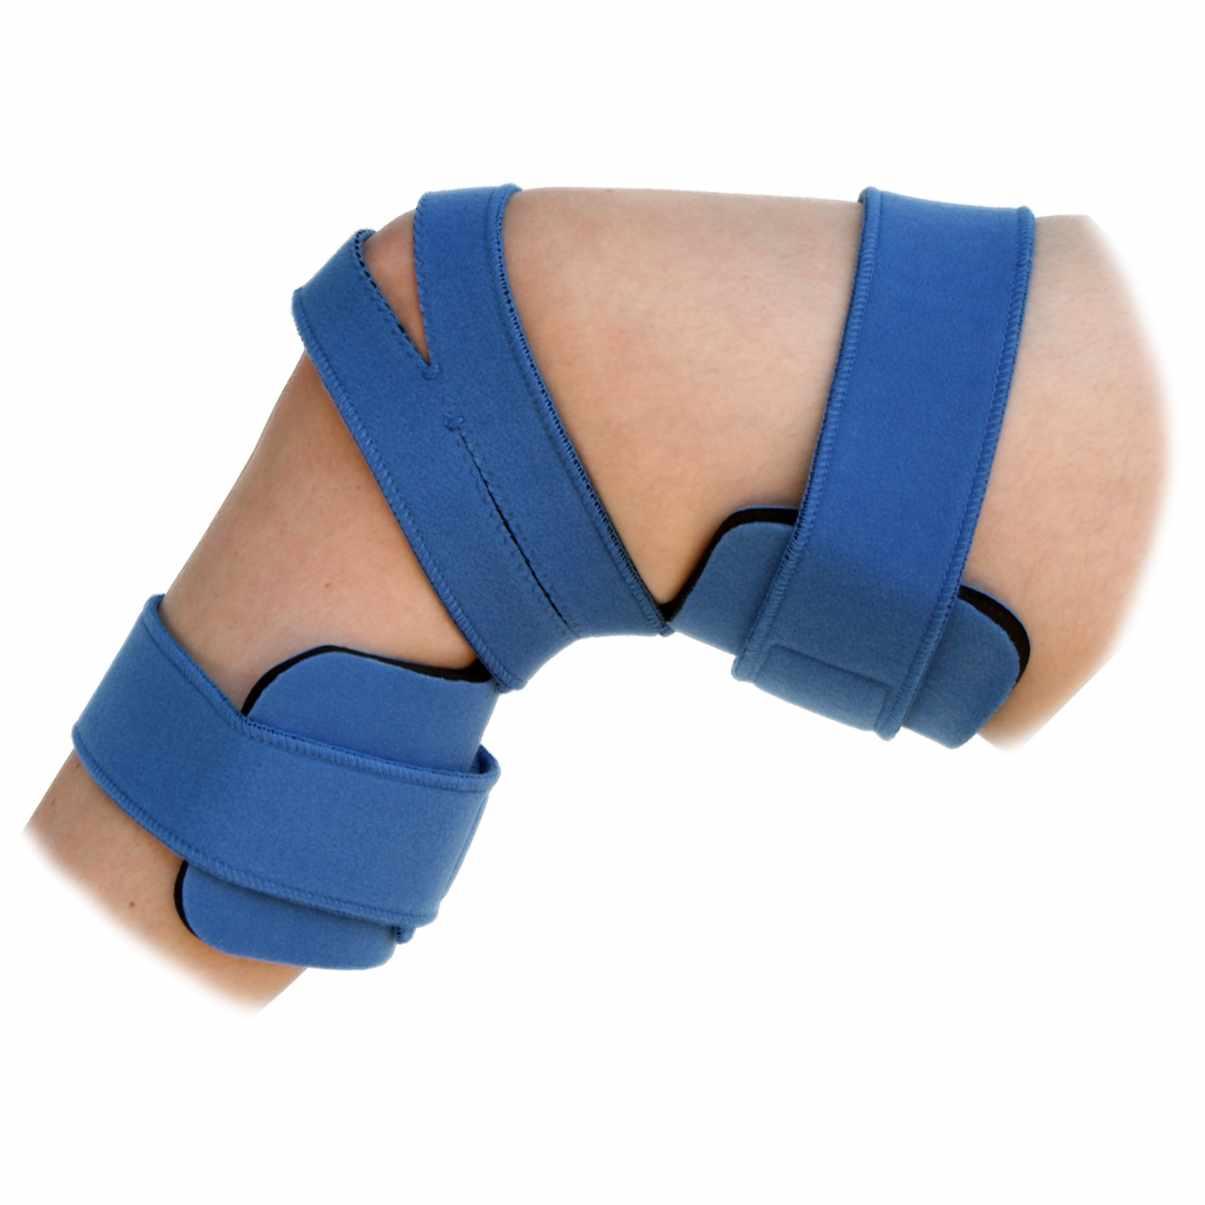 Comfyprene Knee Orthosis